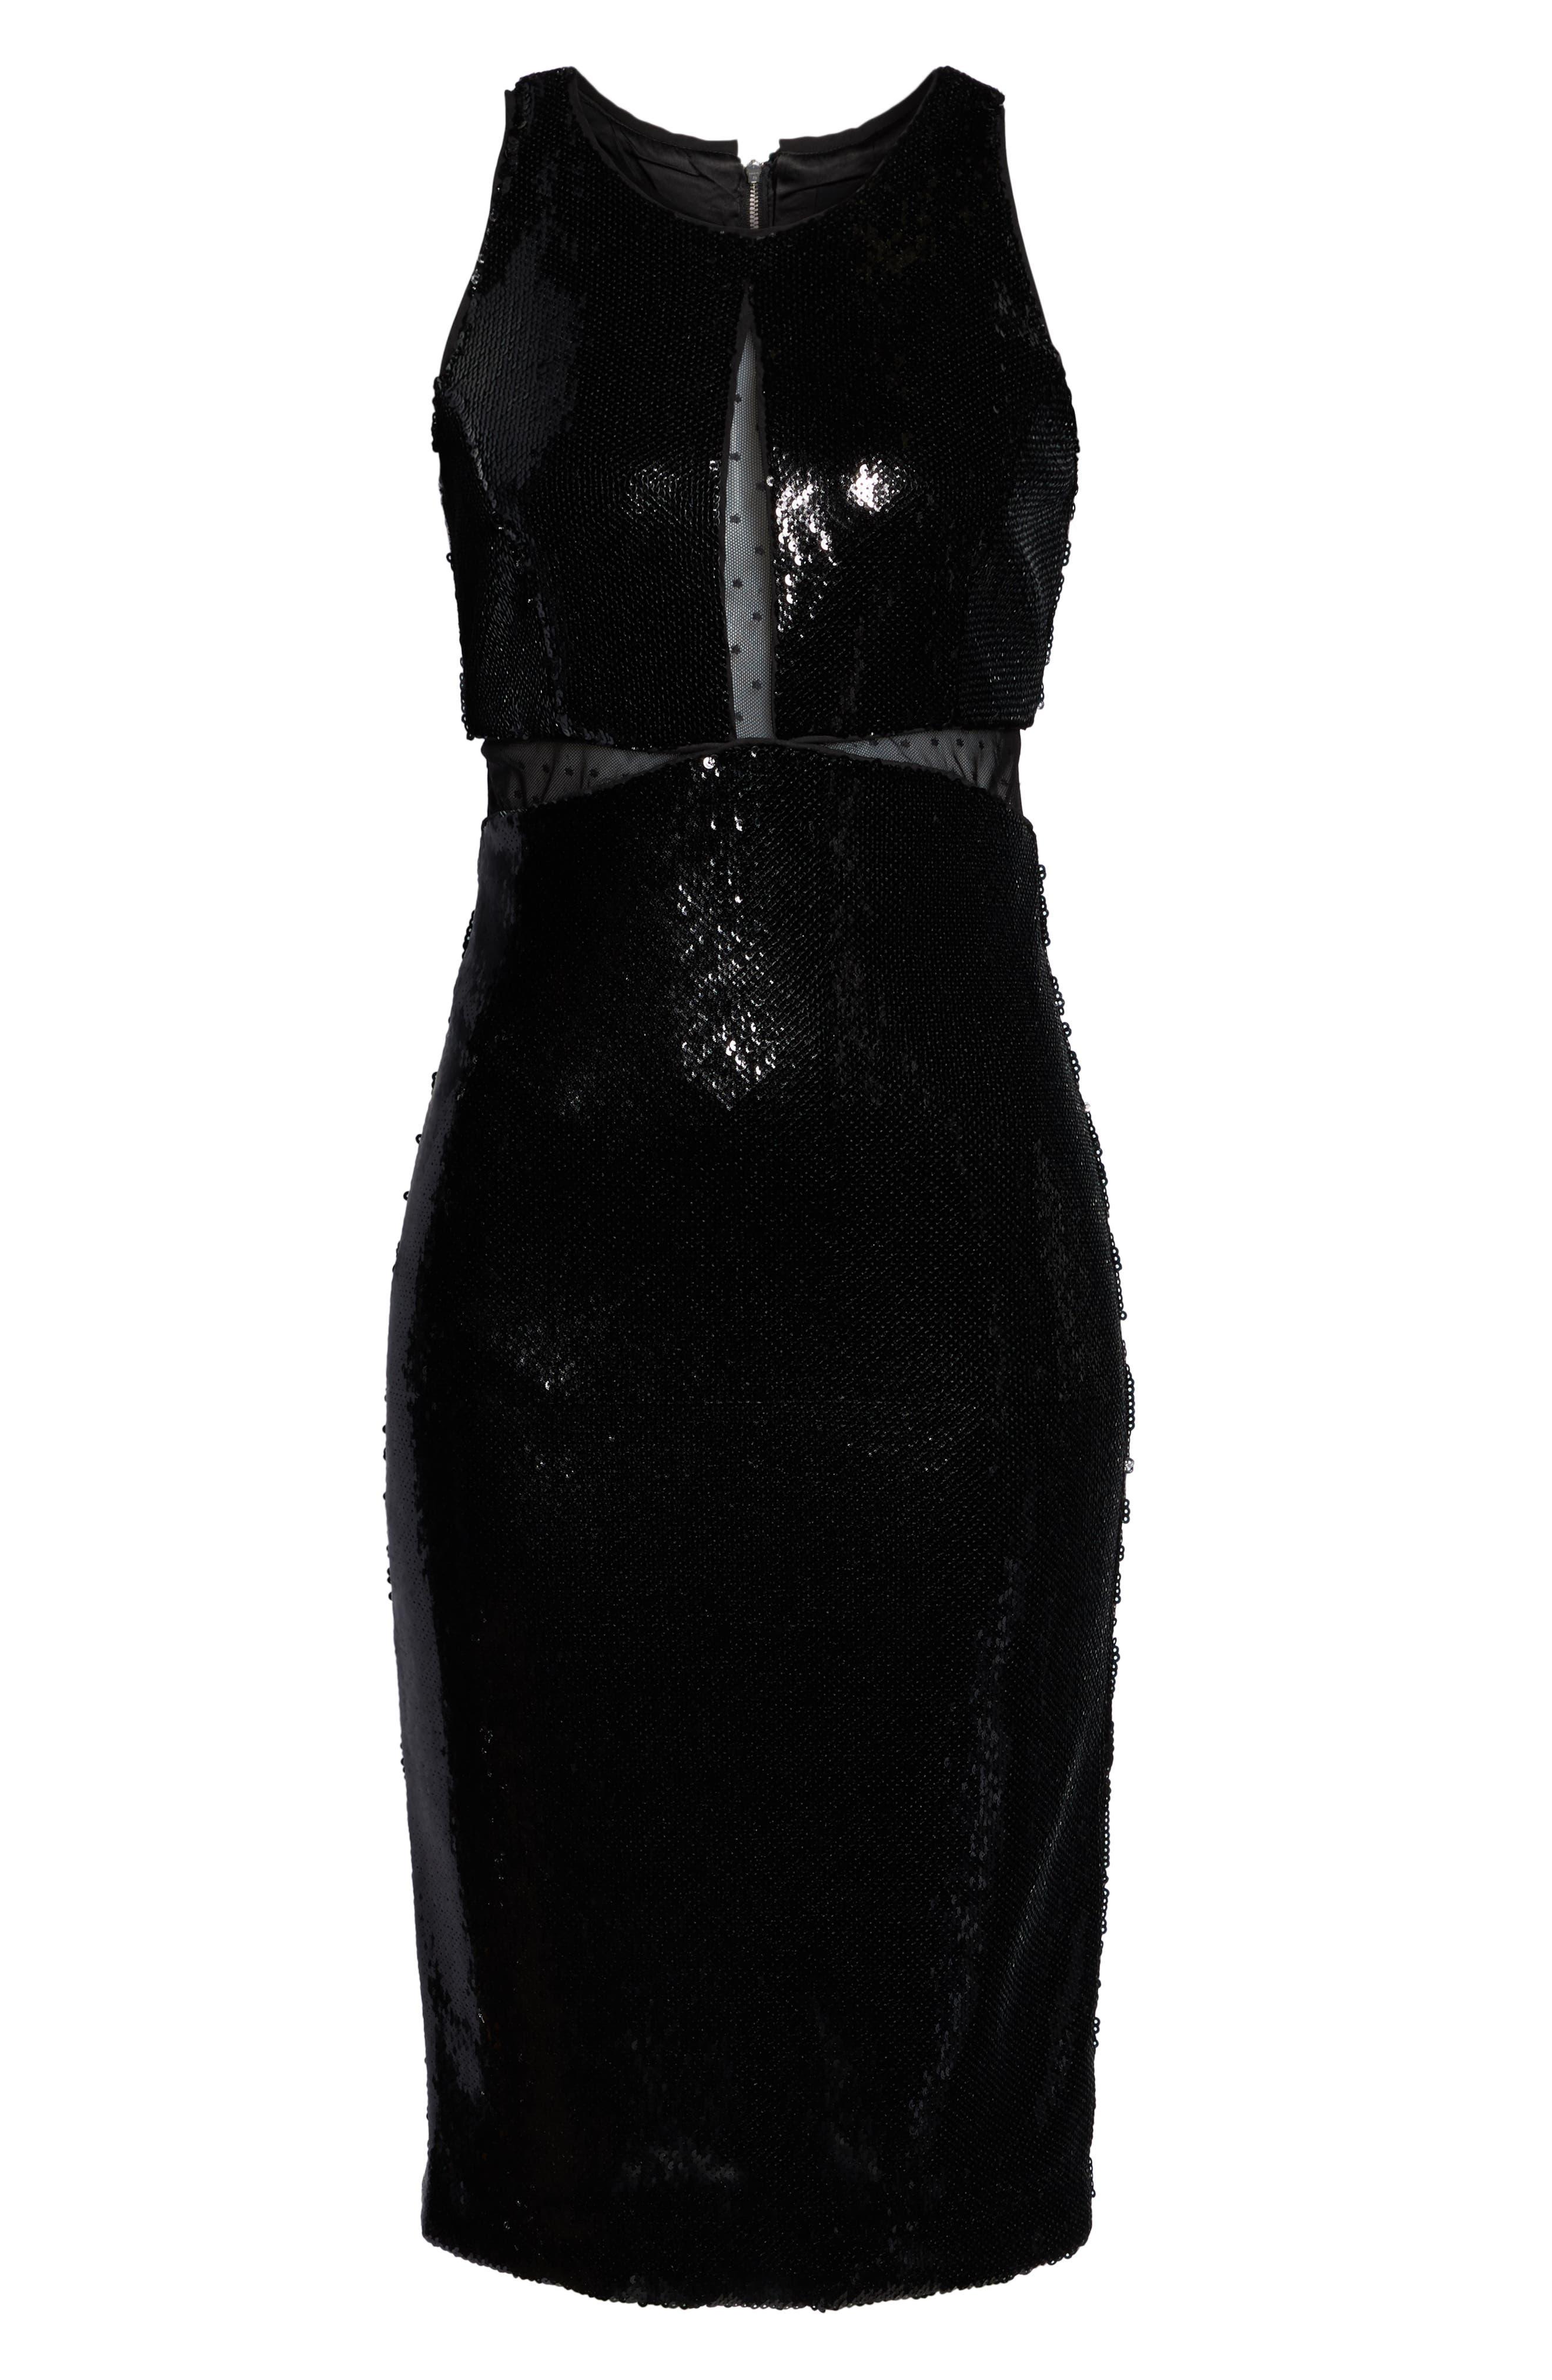 BARDOT,                             Splice Sequin Sheath Dress,                             Alternate thumbnail 6, color,                             BLACK